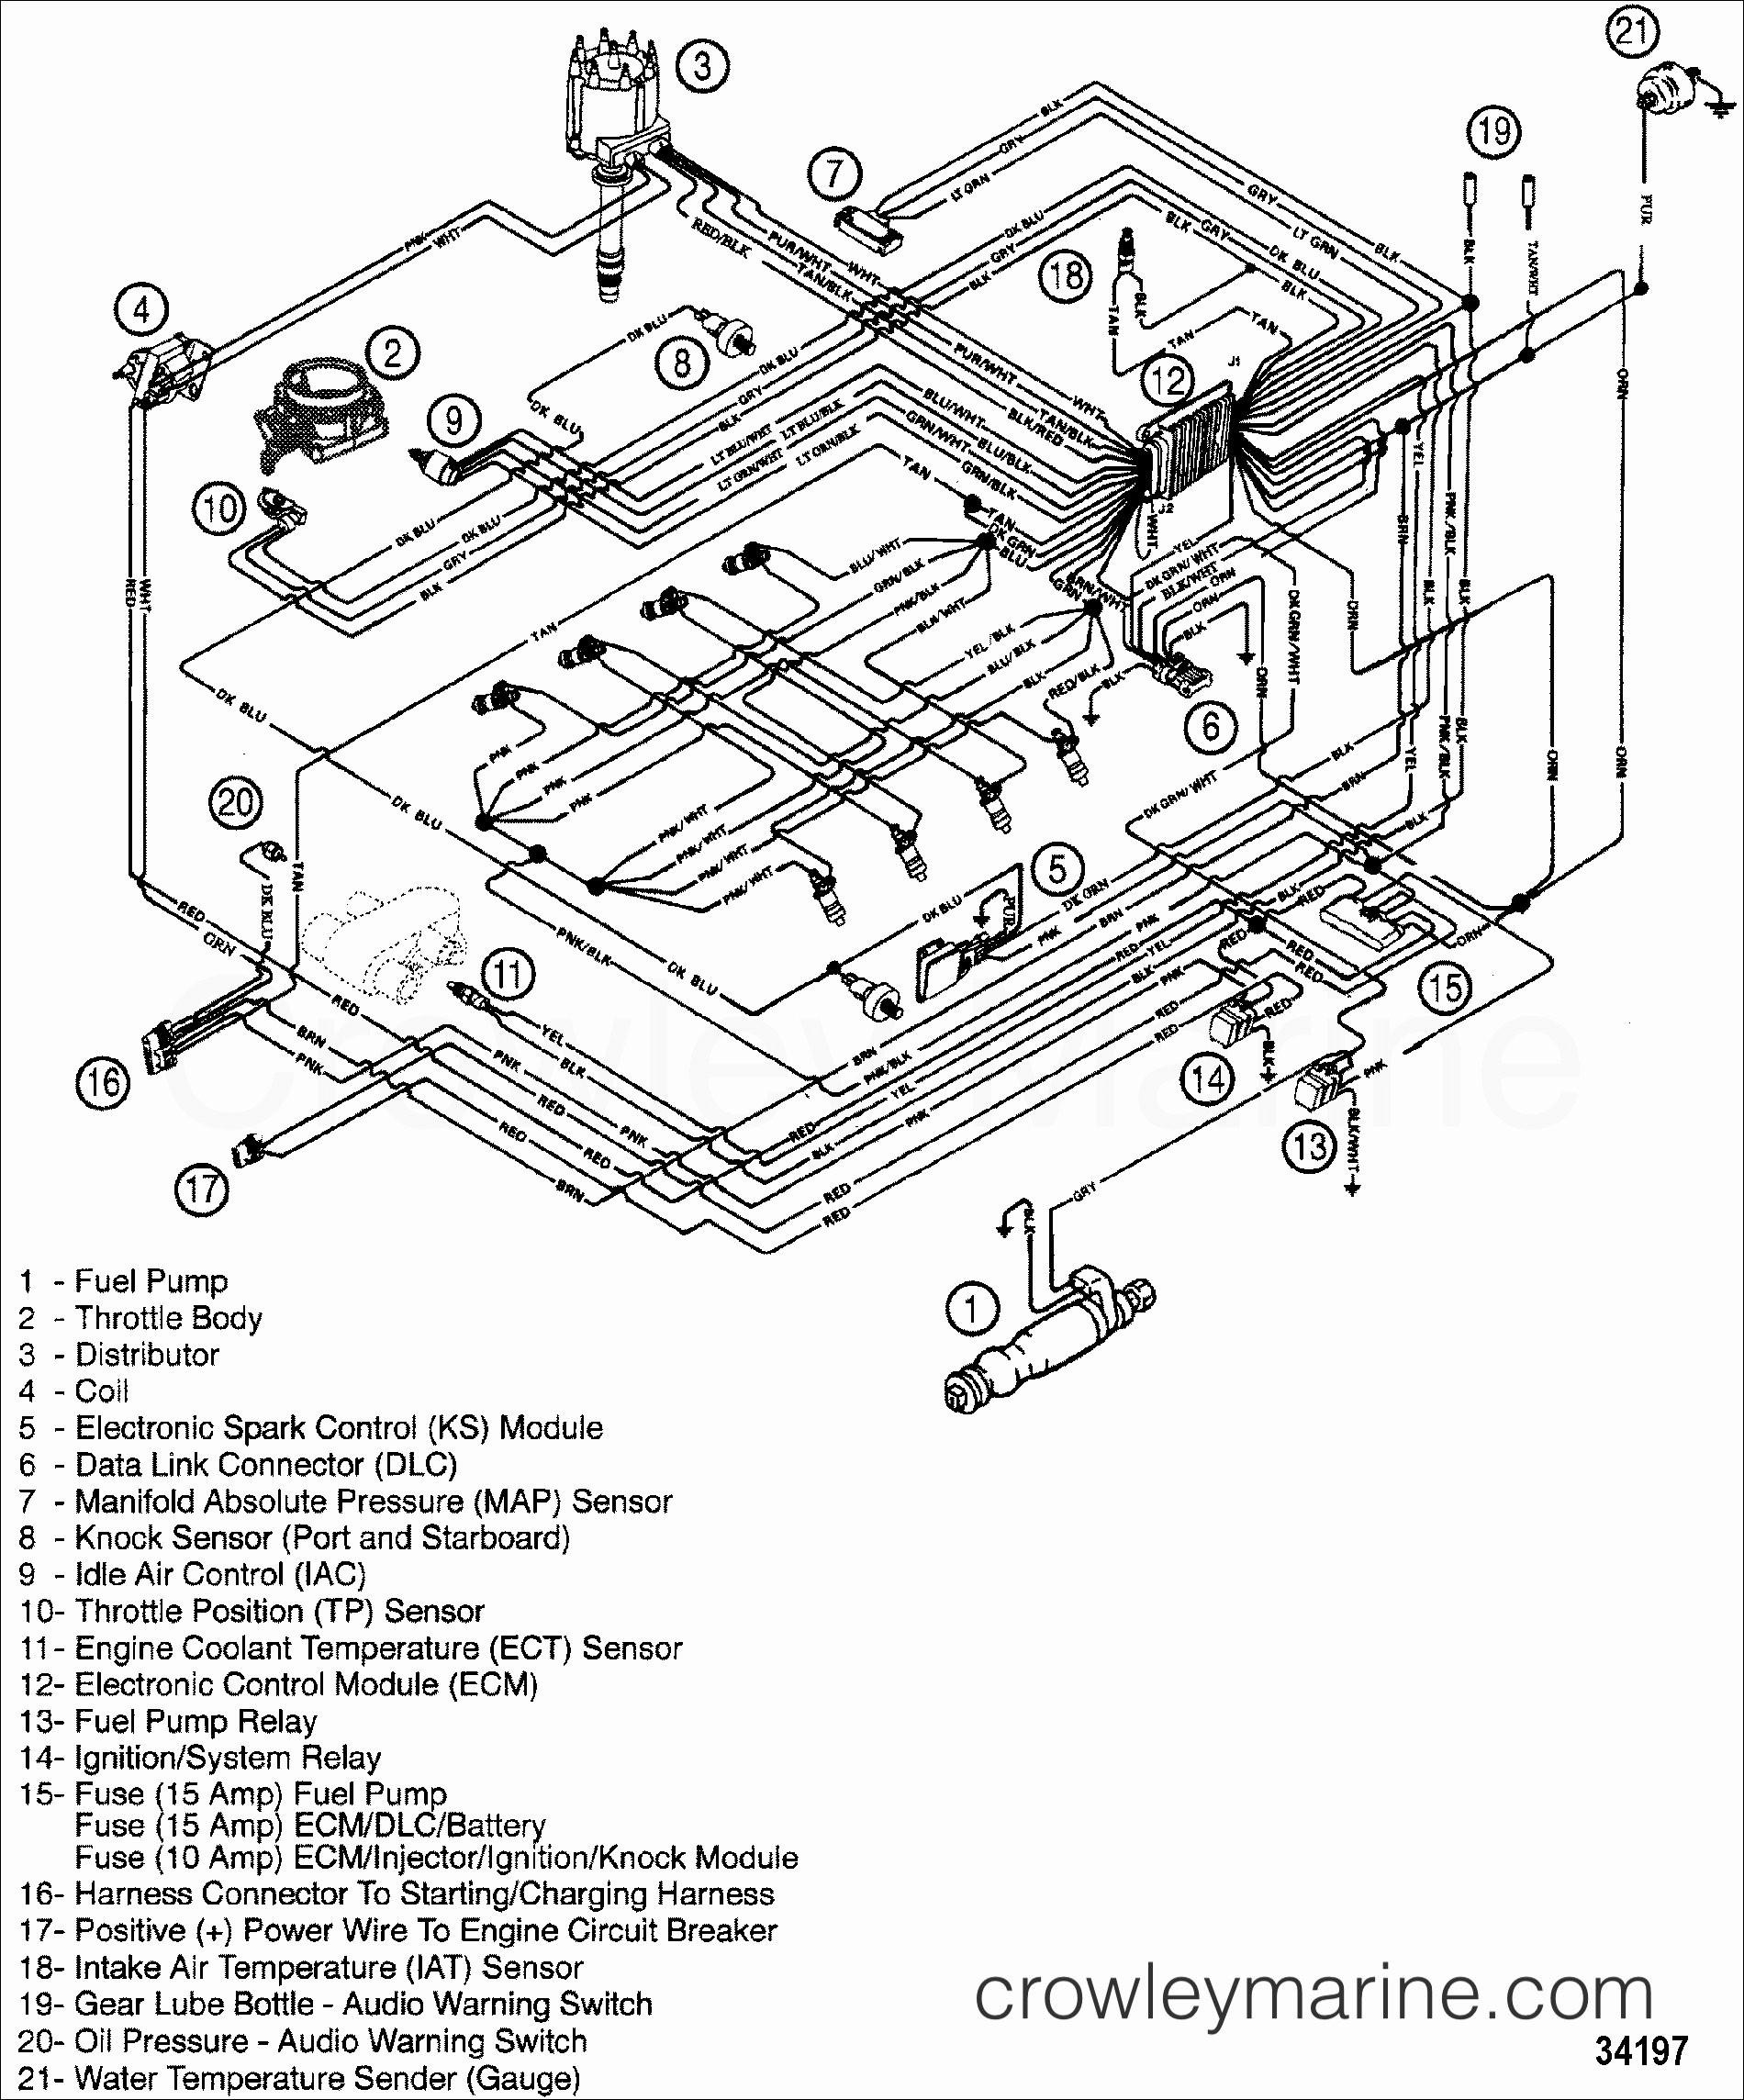 Mercruiser Thunderbolt Iv Ignition Wiring Diagram Fresh Old Fashioned Mercruiser Trim Sender Wiring Diagram Ensign